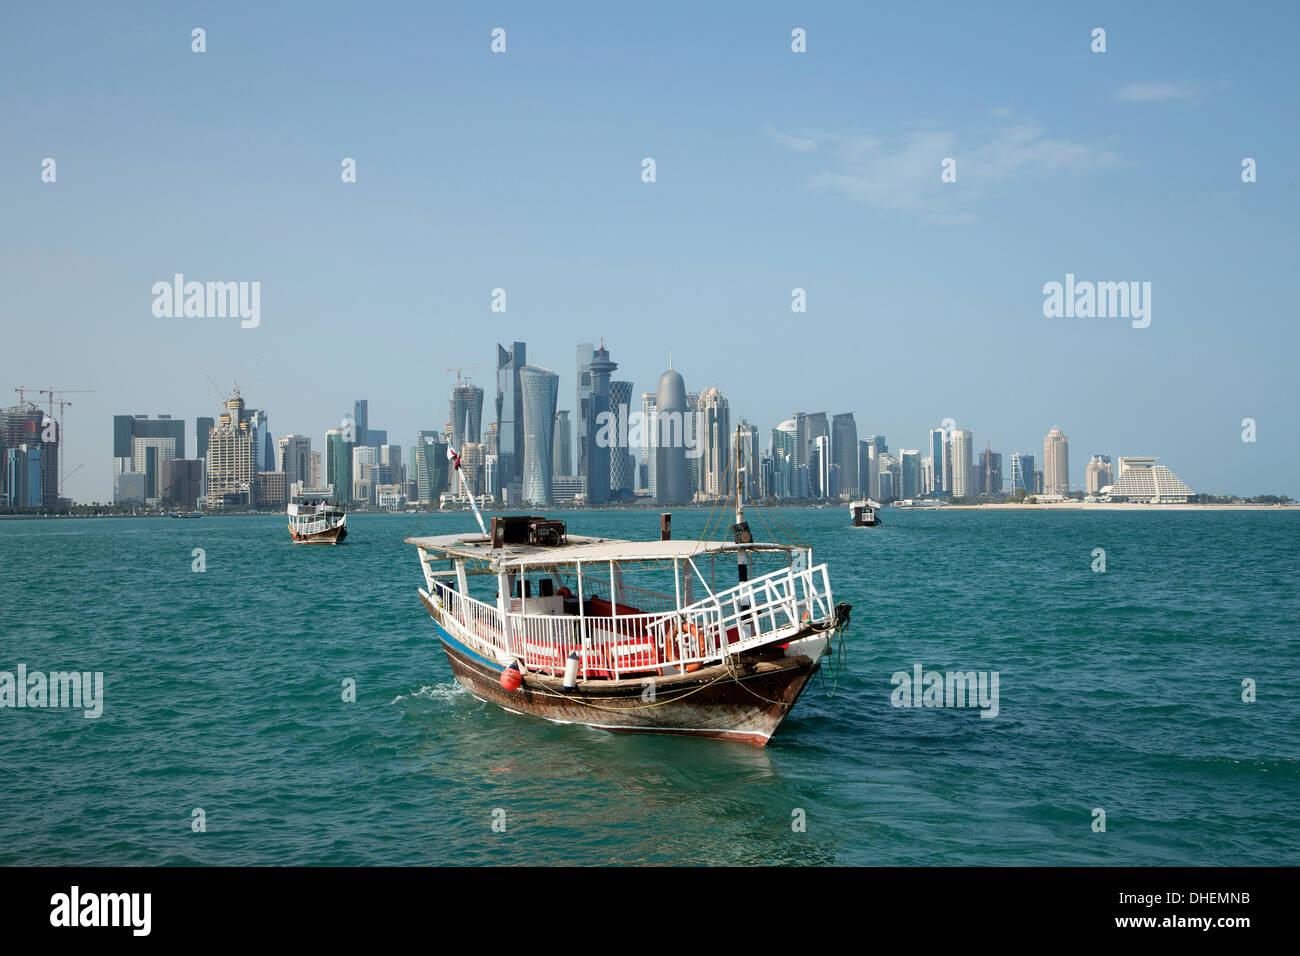 Futuristic skyscrapers in Doha, Qatar, Middle East Stock Photo